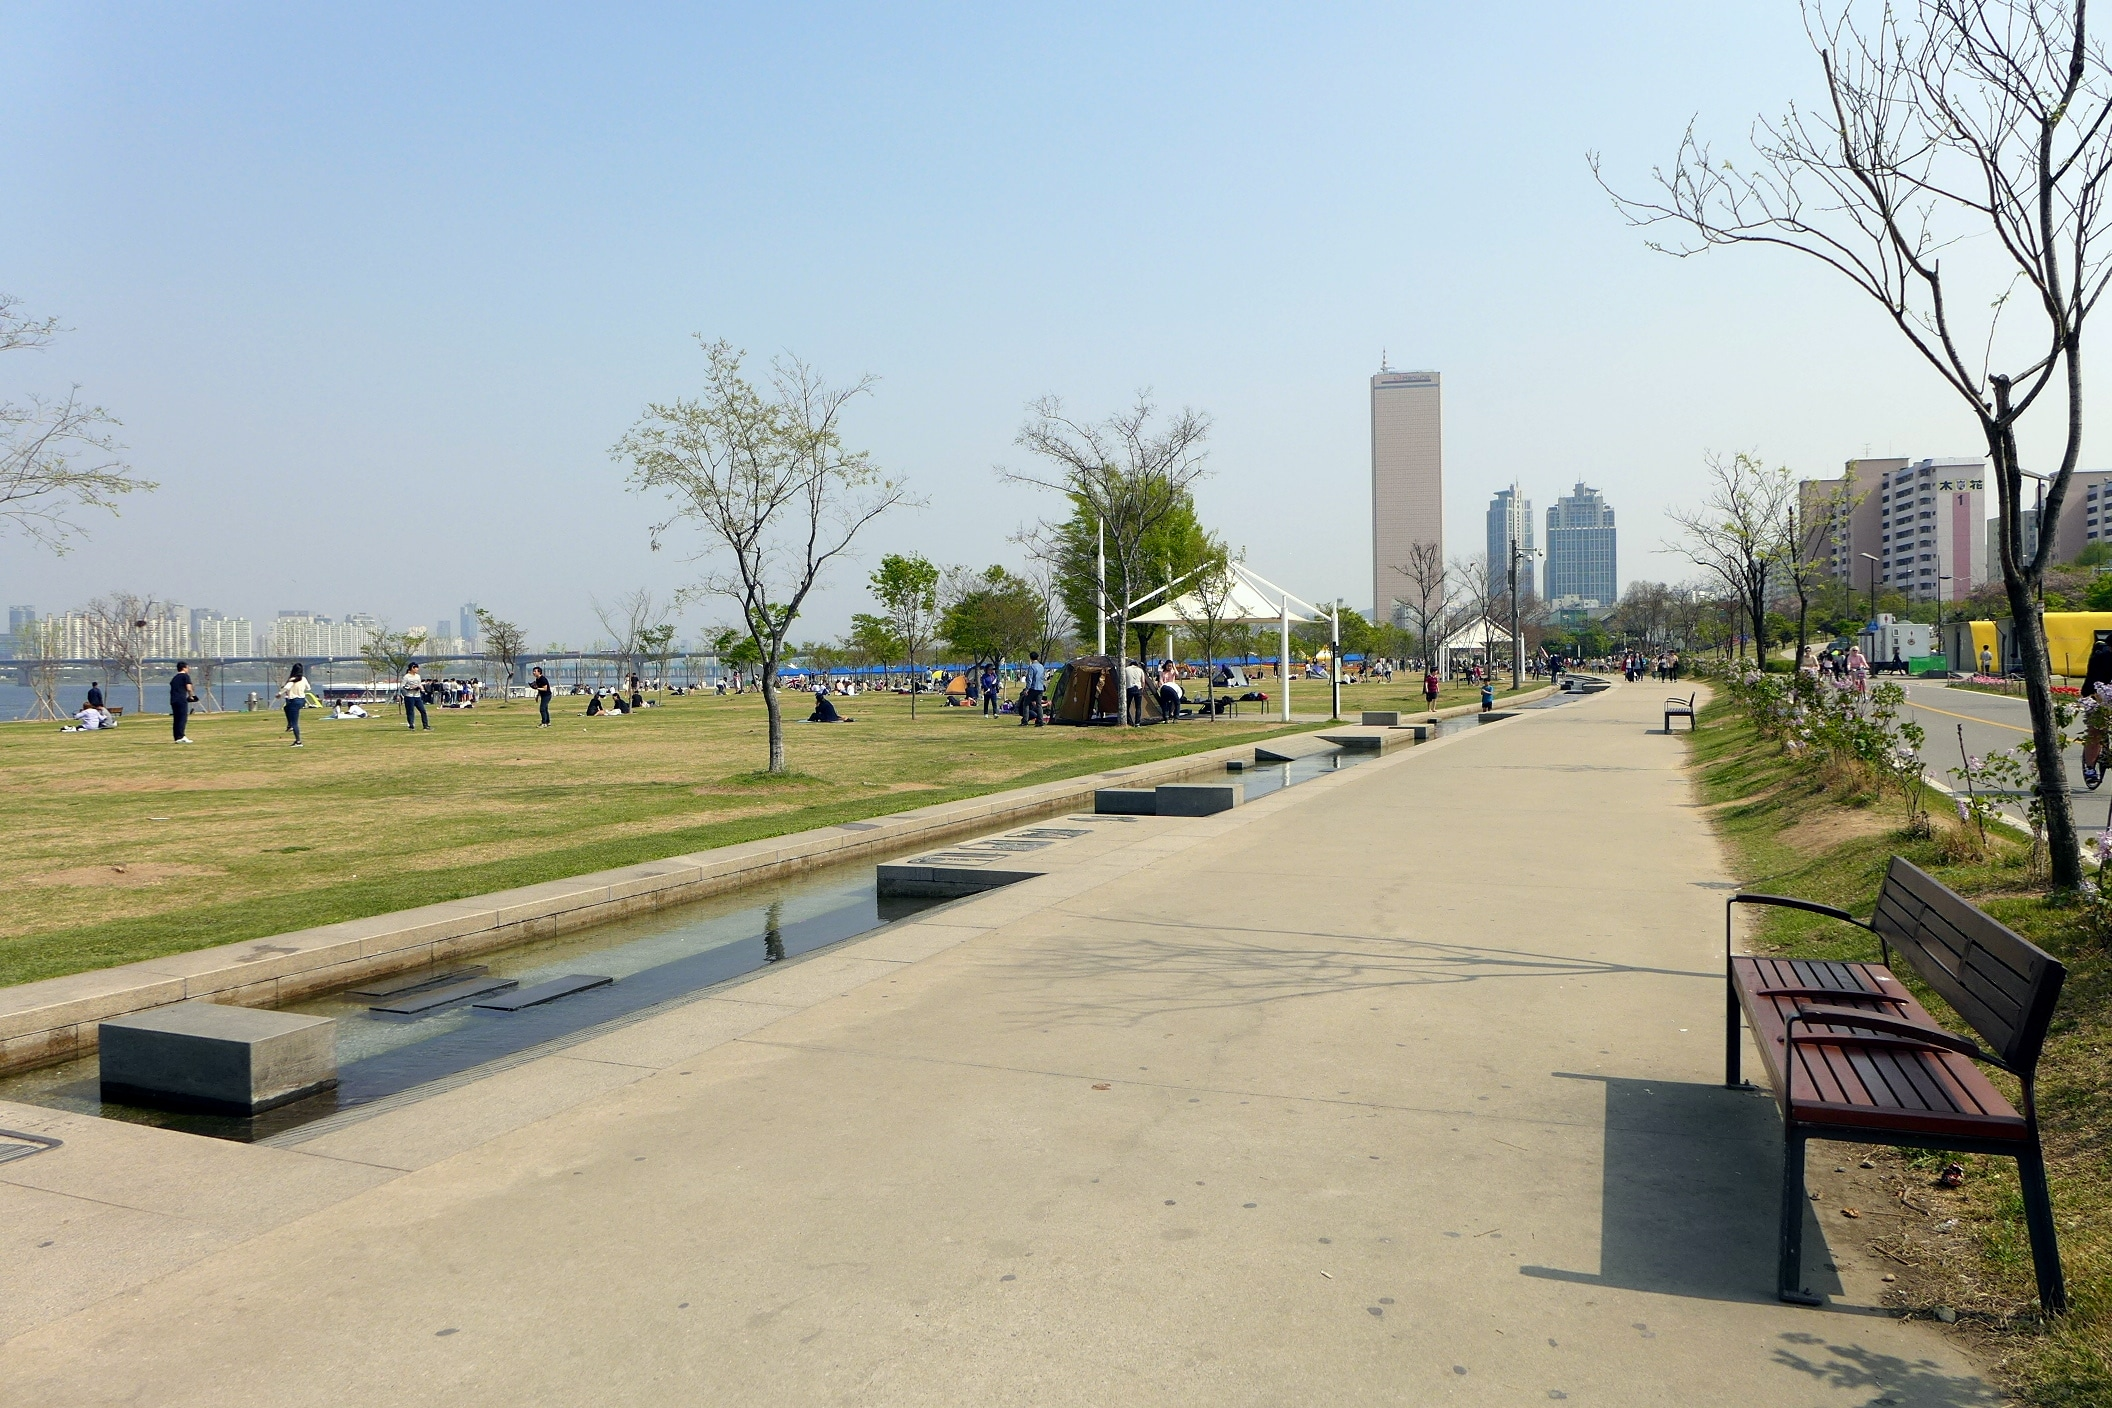 Drama Korea - Yeouido Hangang Park (wikipedia)